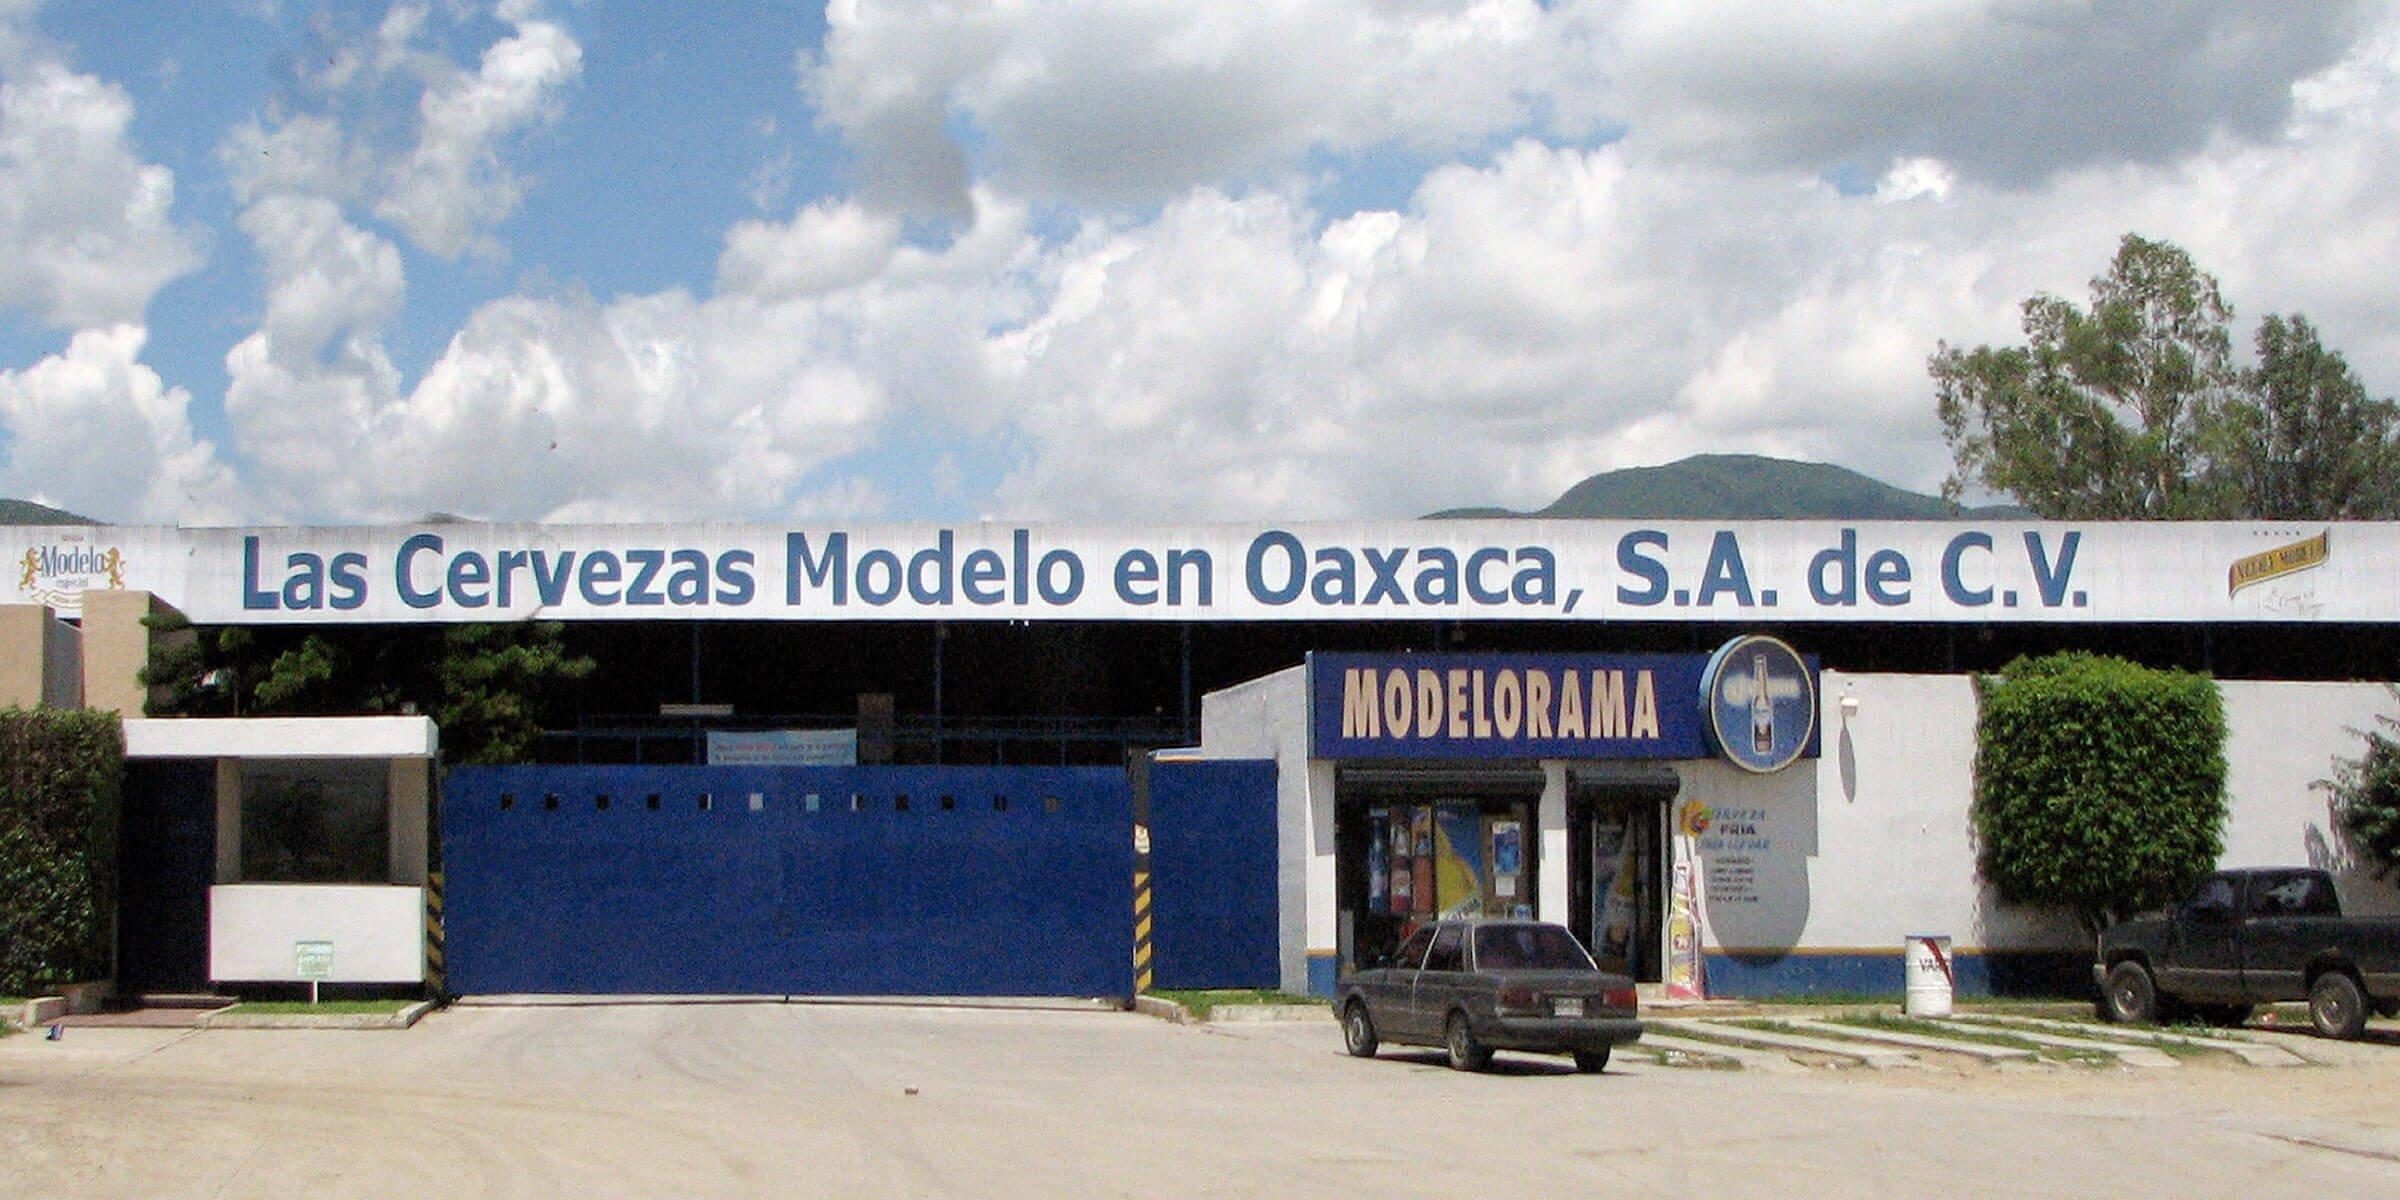 Outside the Grupo Modelo brewery in Oaxaca, Mexico